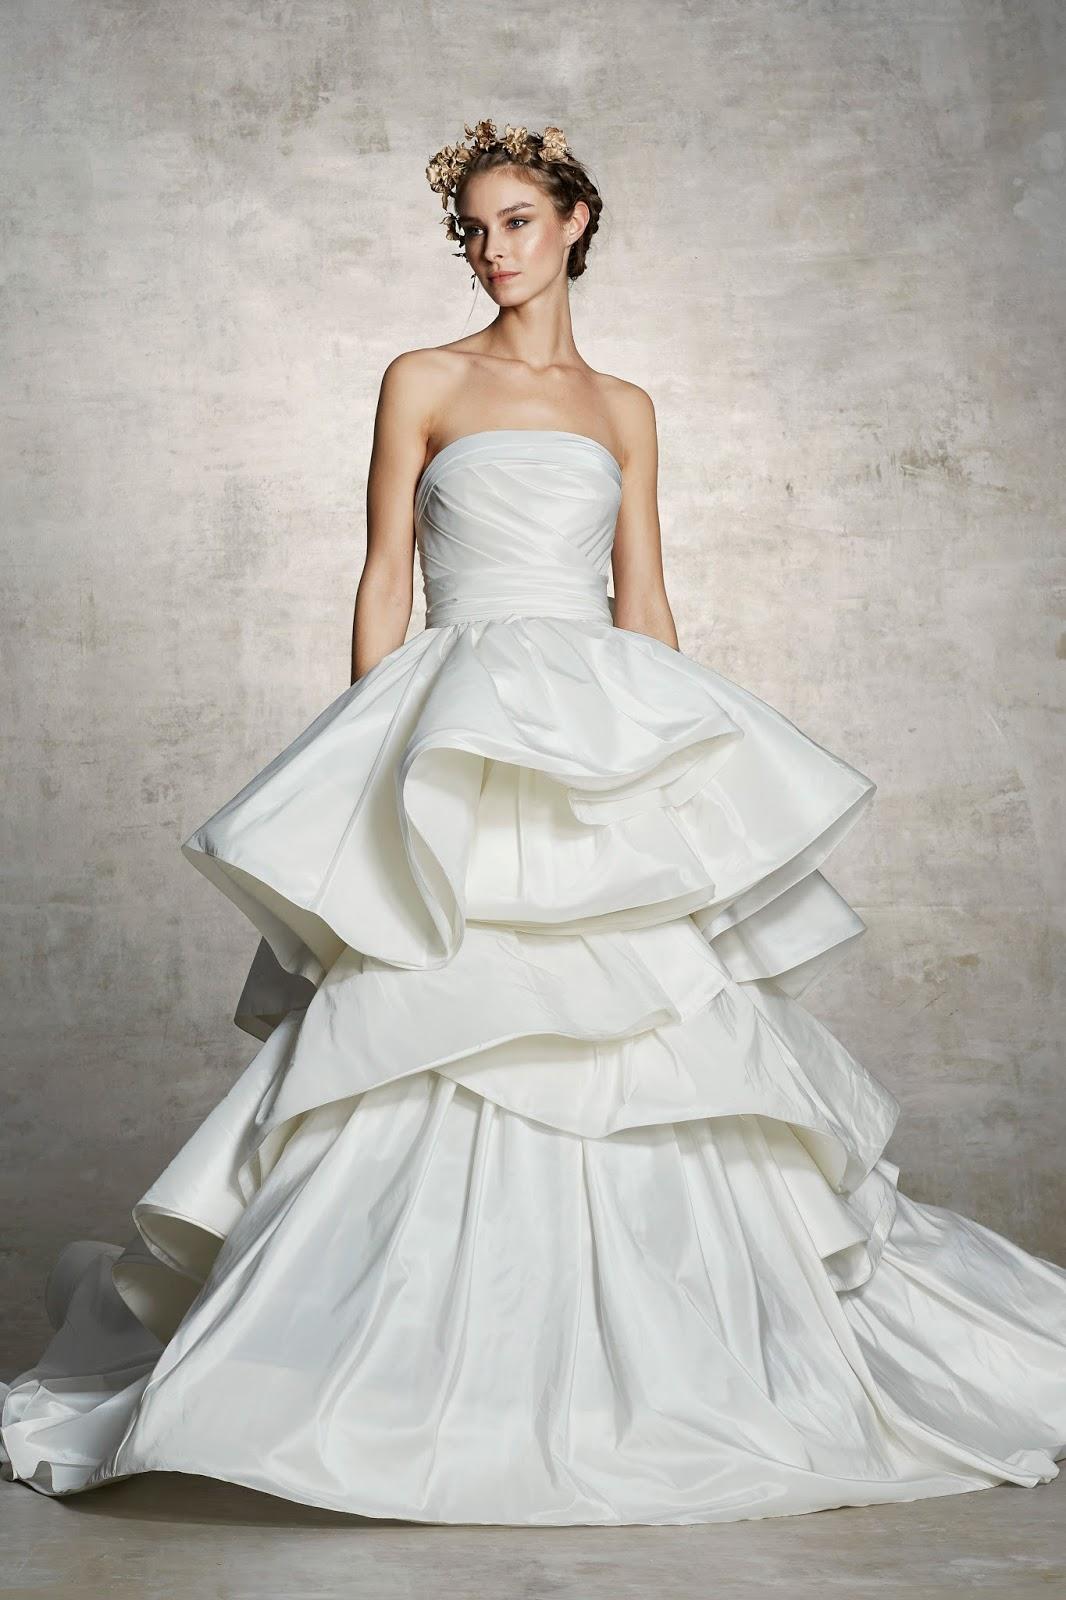 Mom\'s Turf: Gorgeous Bridal Gowns: Marchesa Bridal Spring 2019 ...